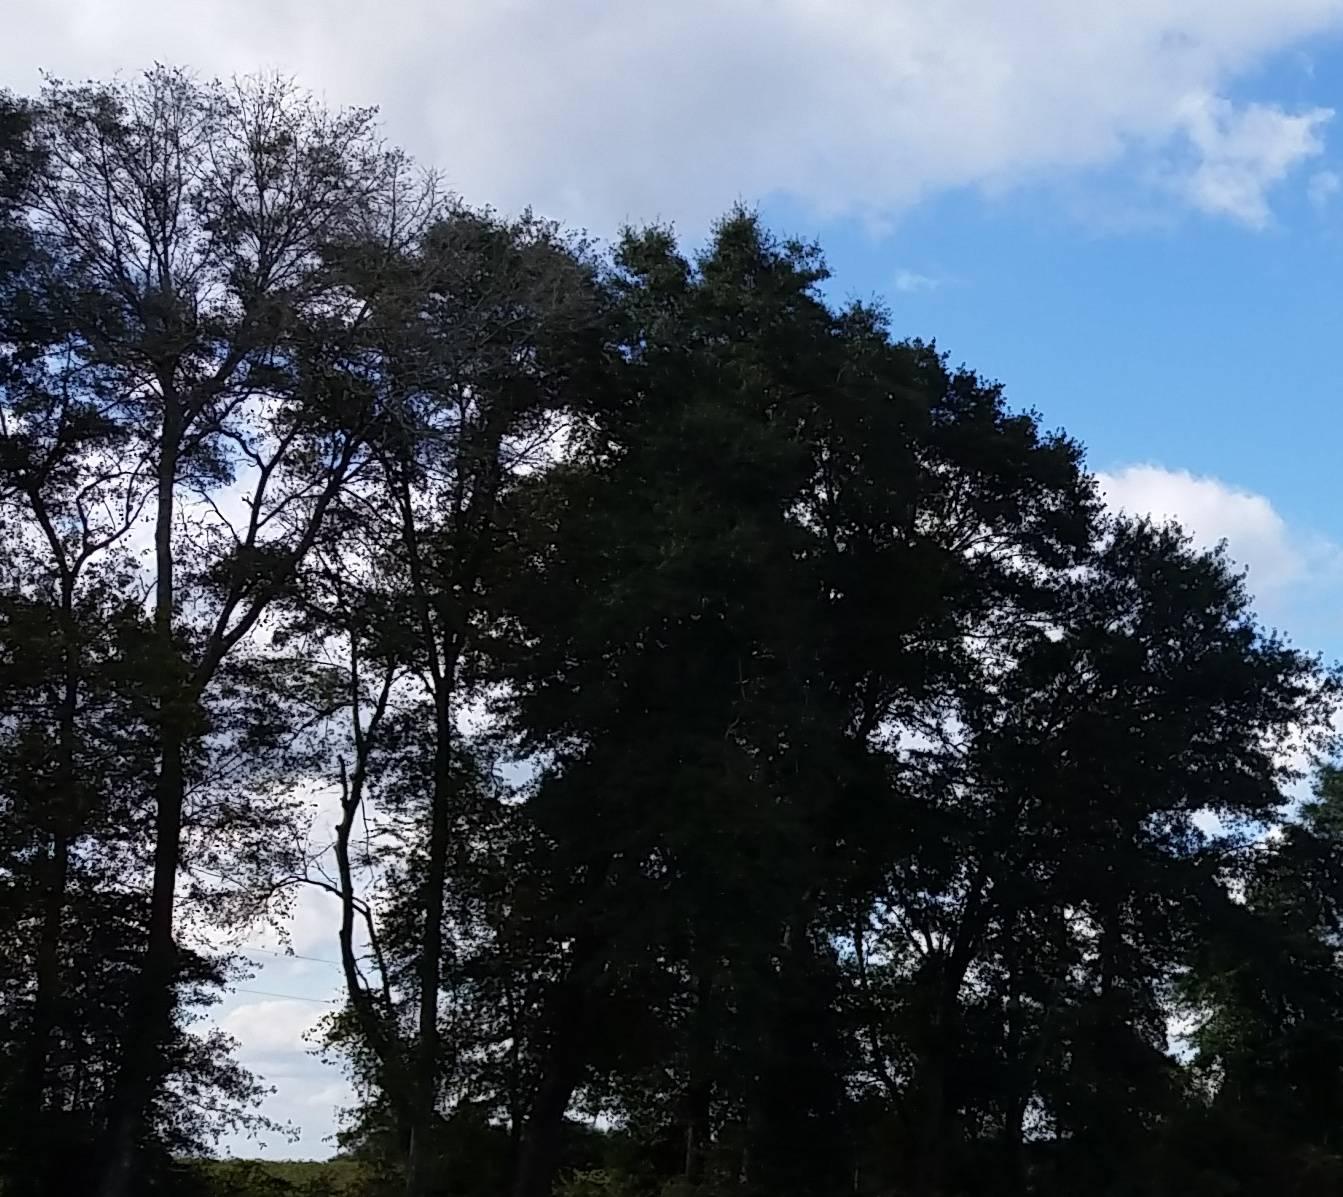 Bama trees